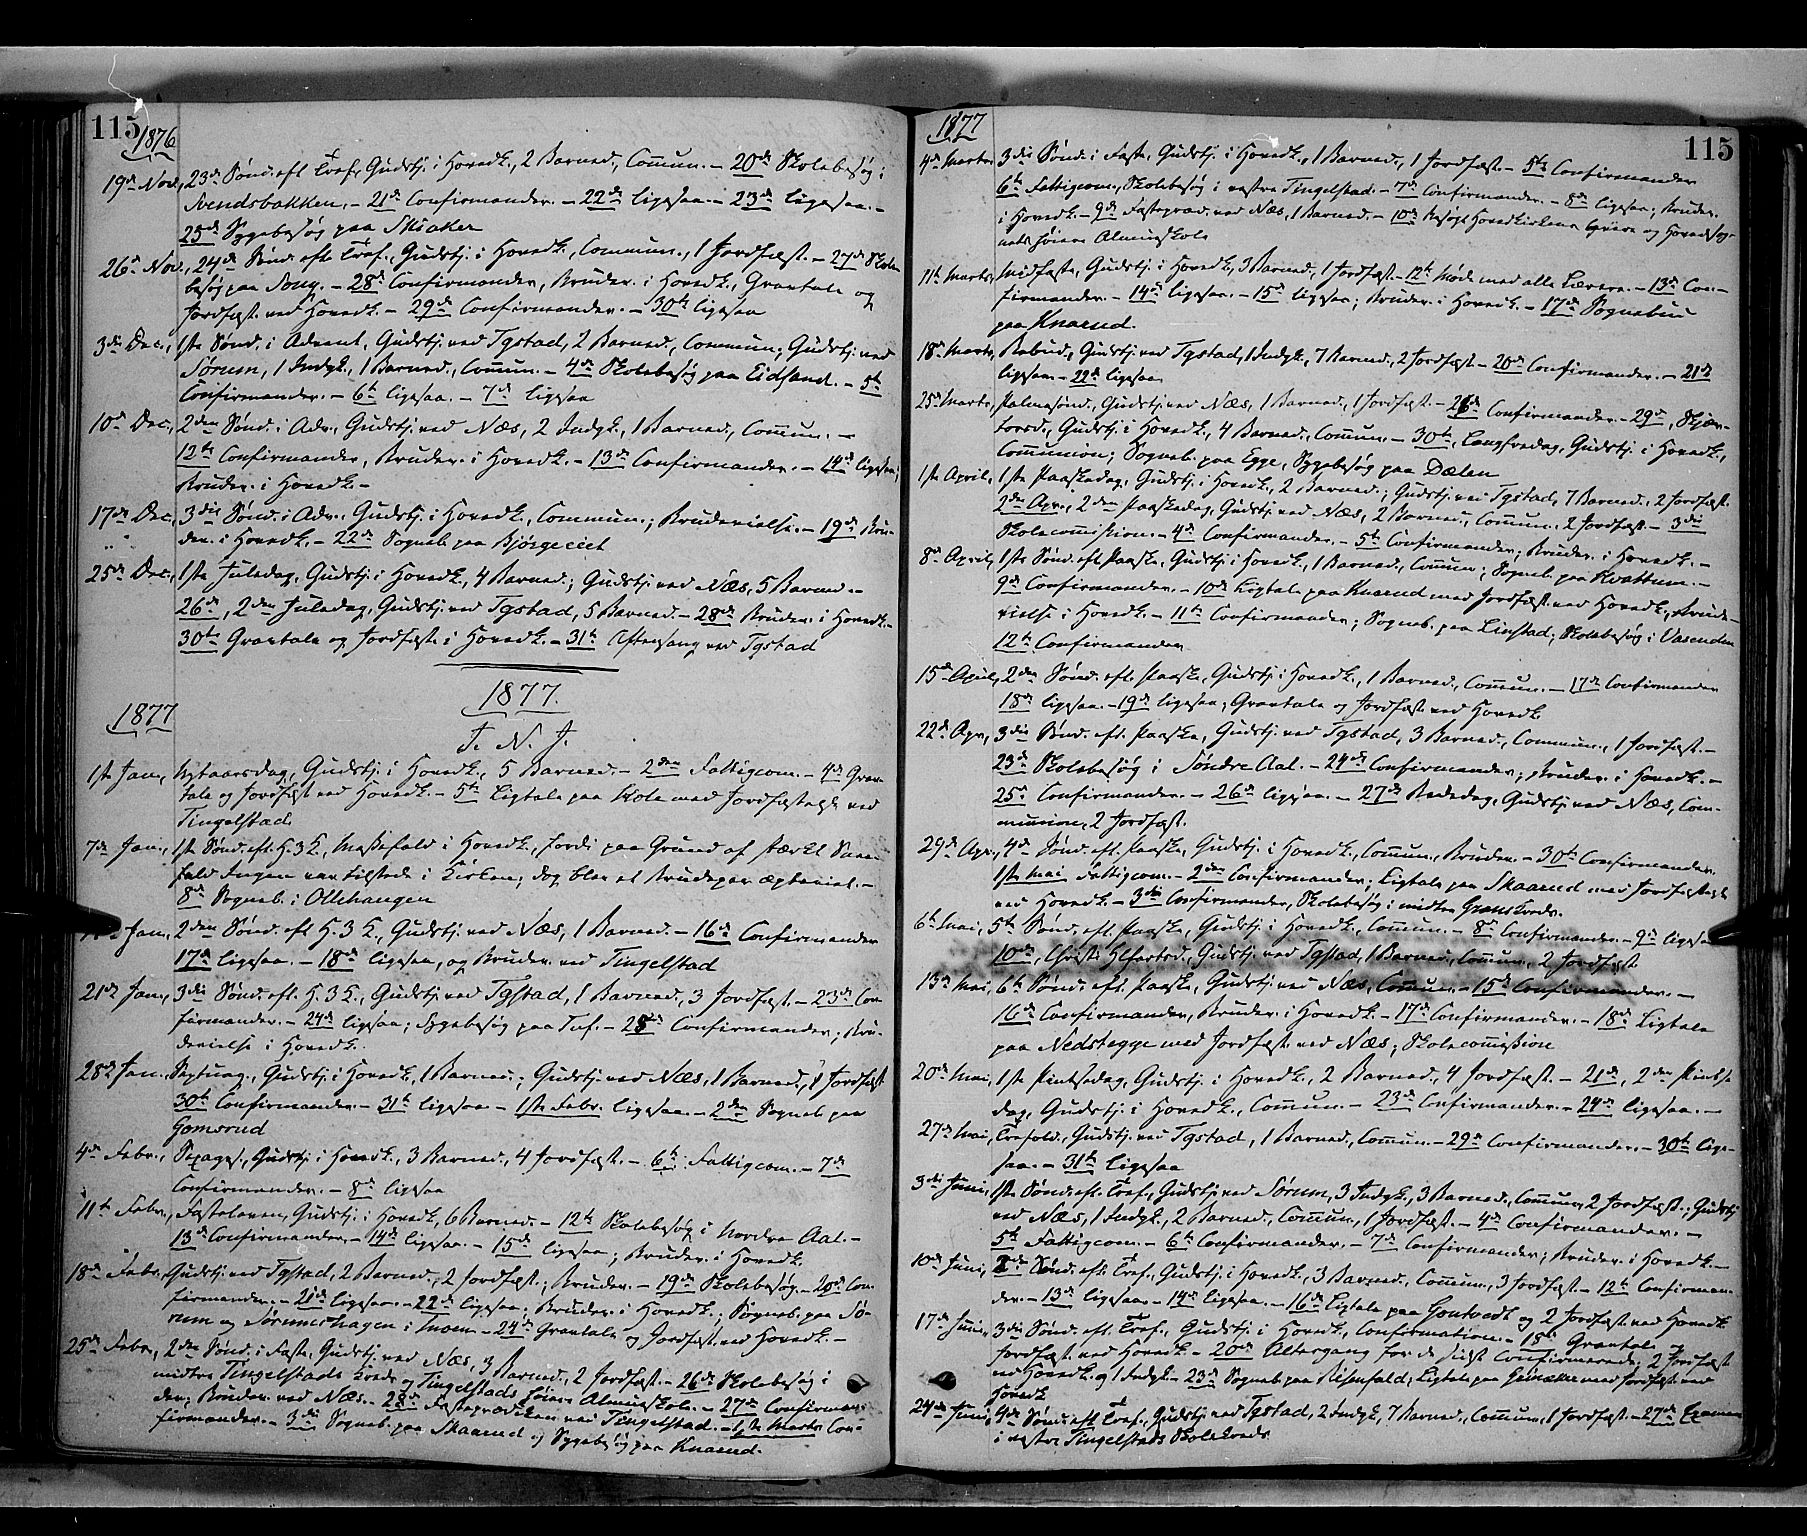 SAH, Gran prestekontor, Ministerialbok nr. 13, 1875-1879, s. 115